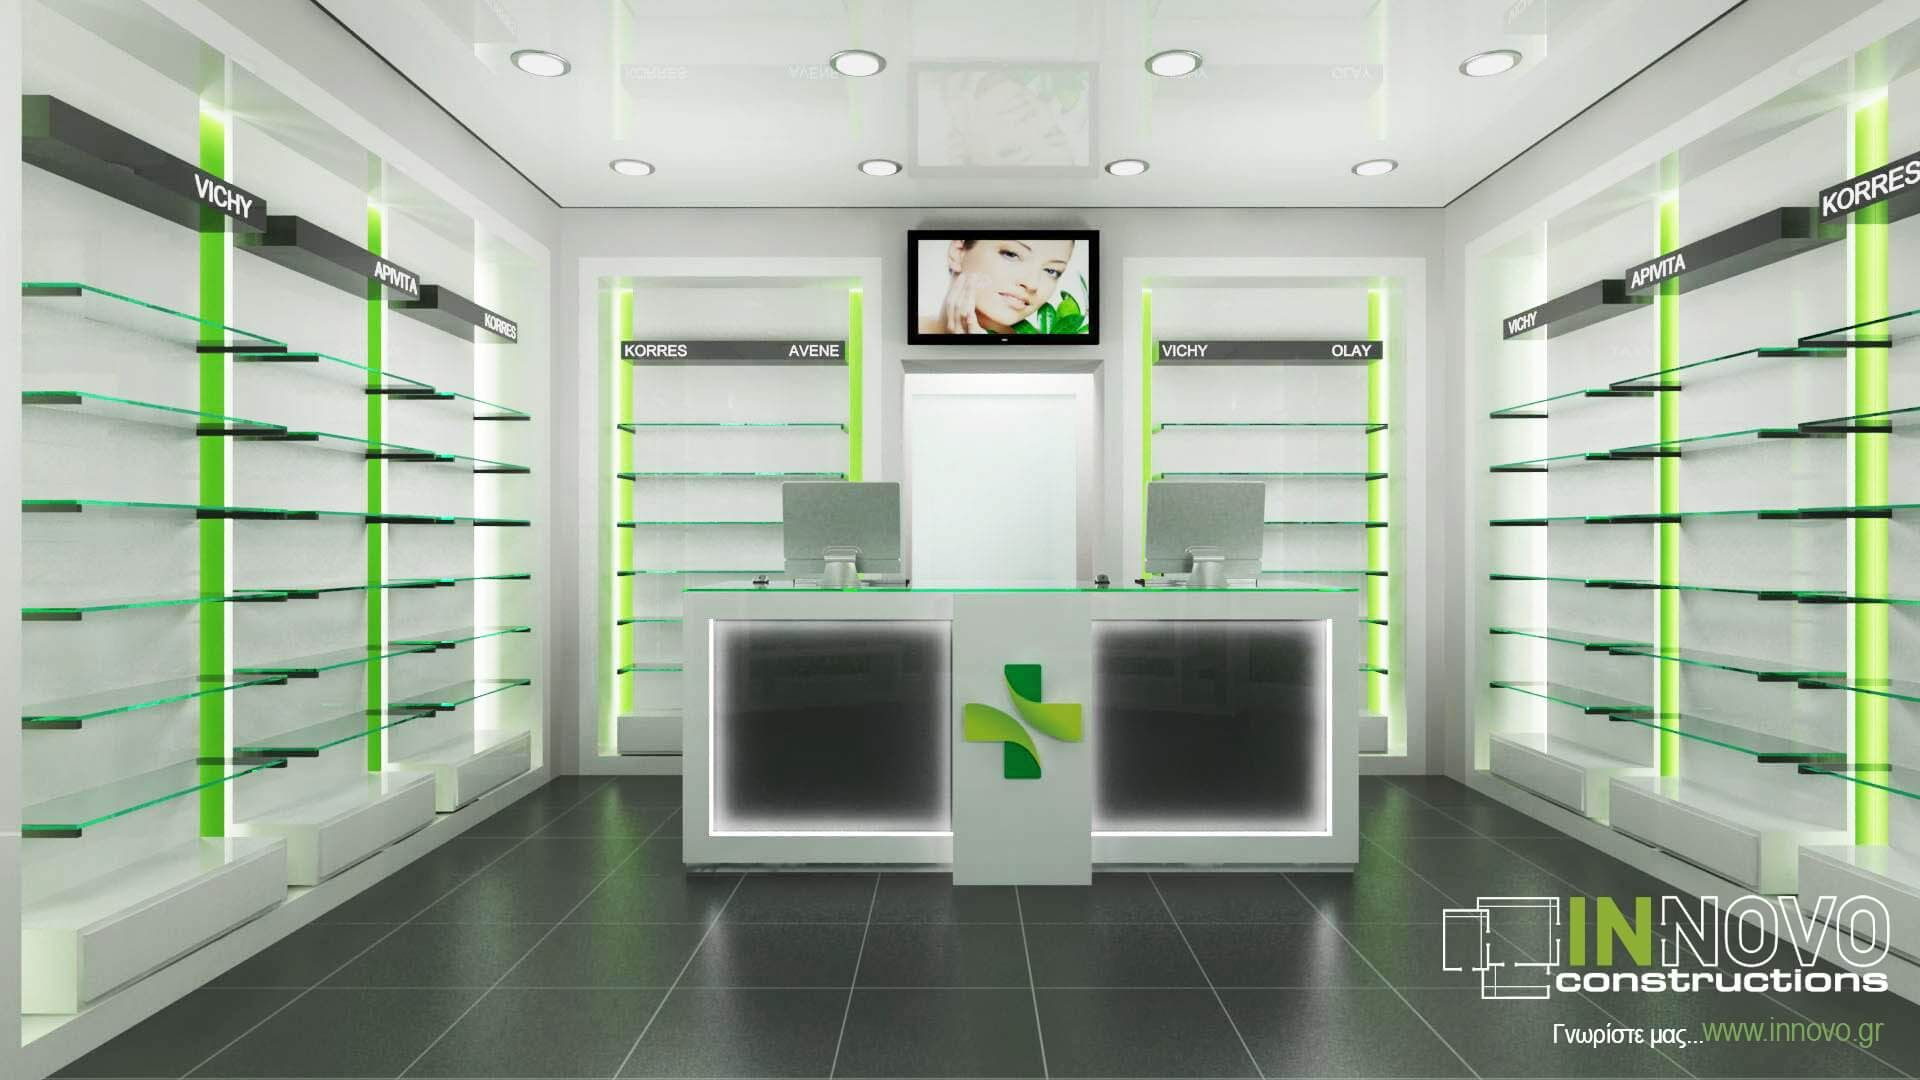 INNOVO Pharmacy Construction in Acharne Store design